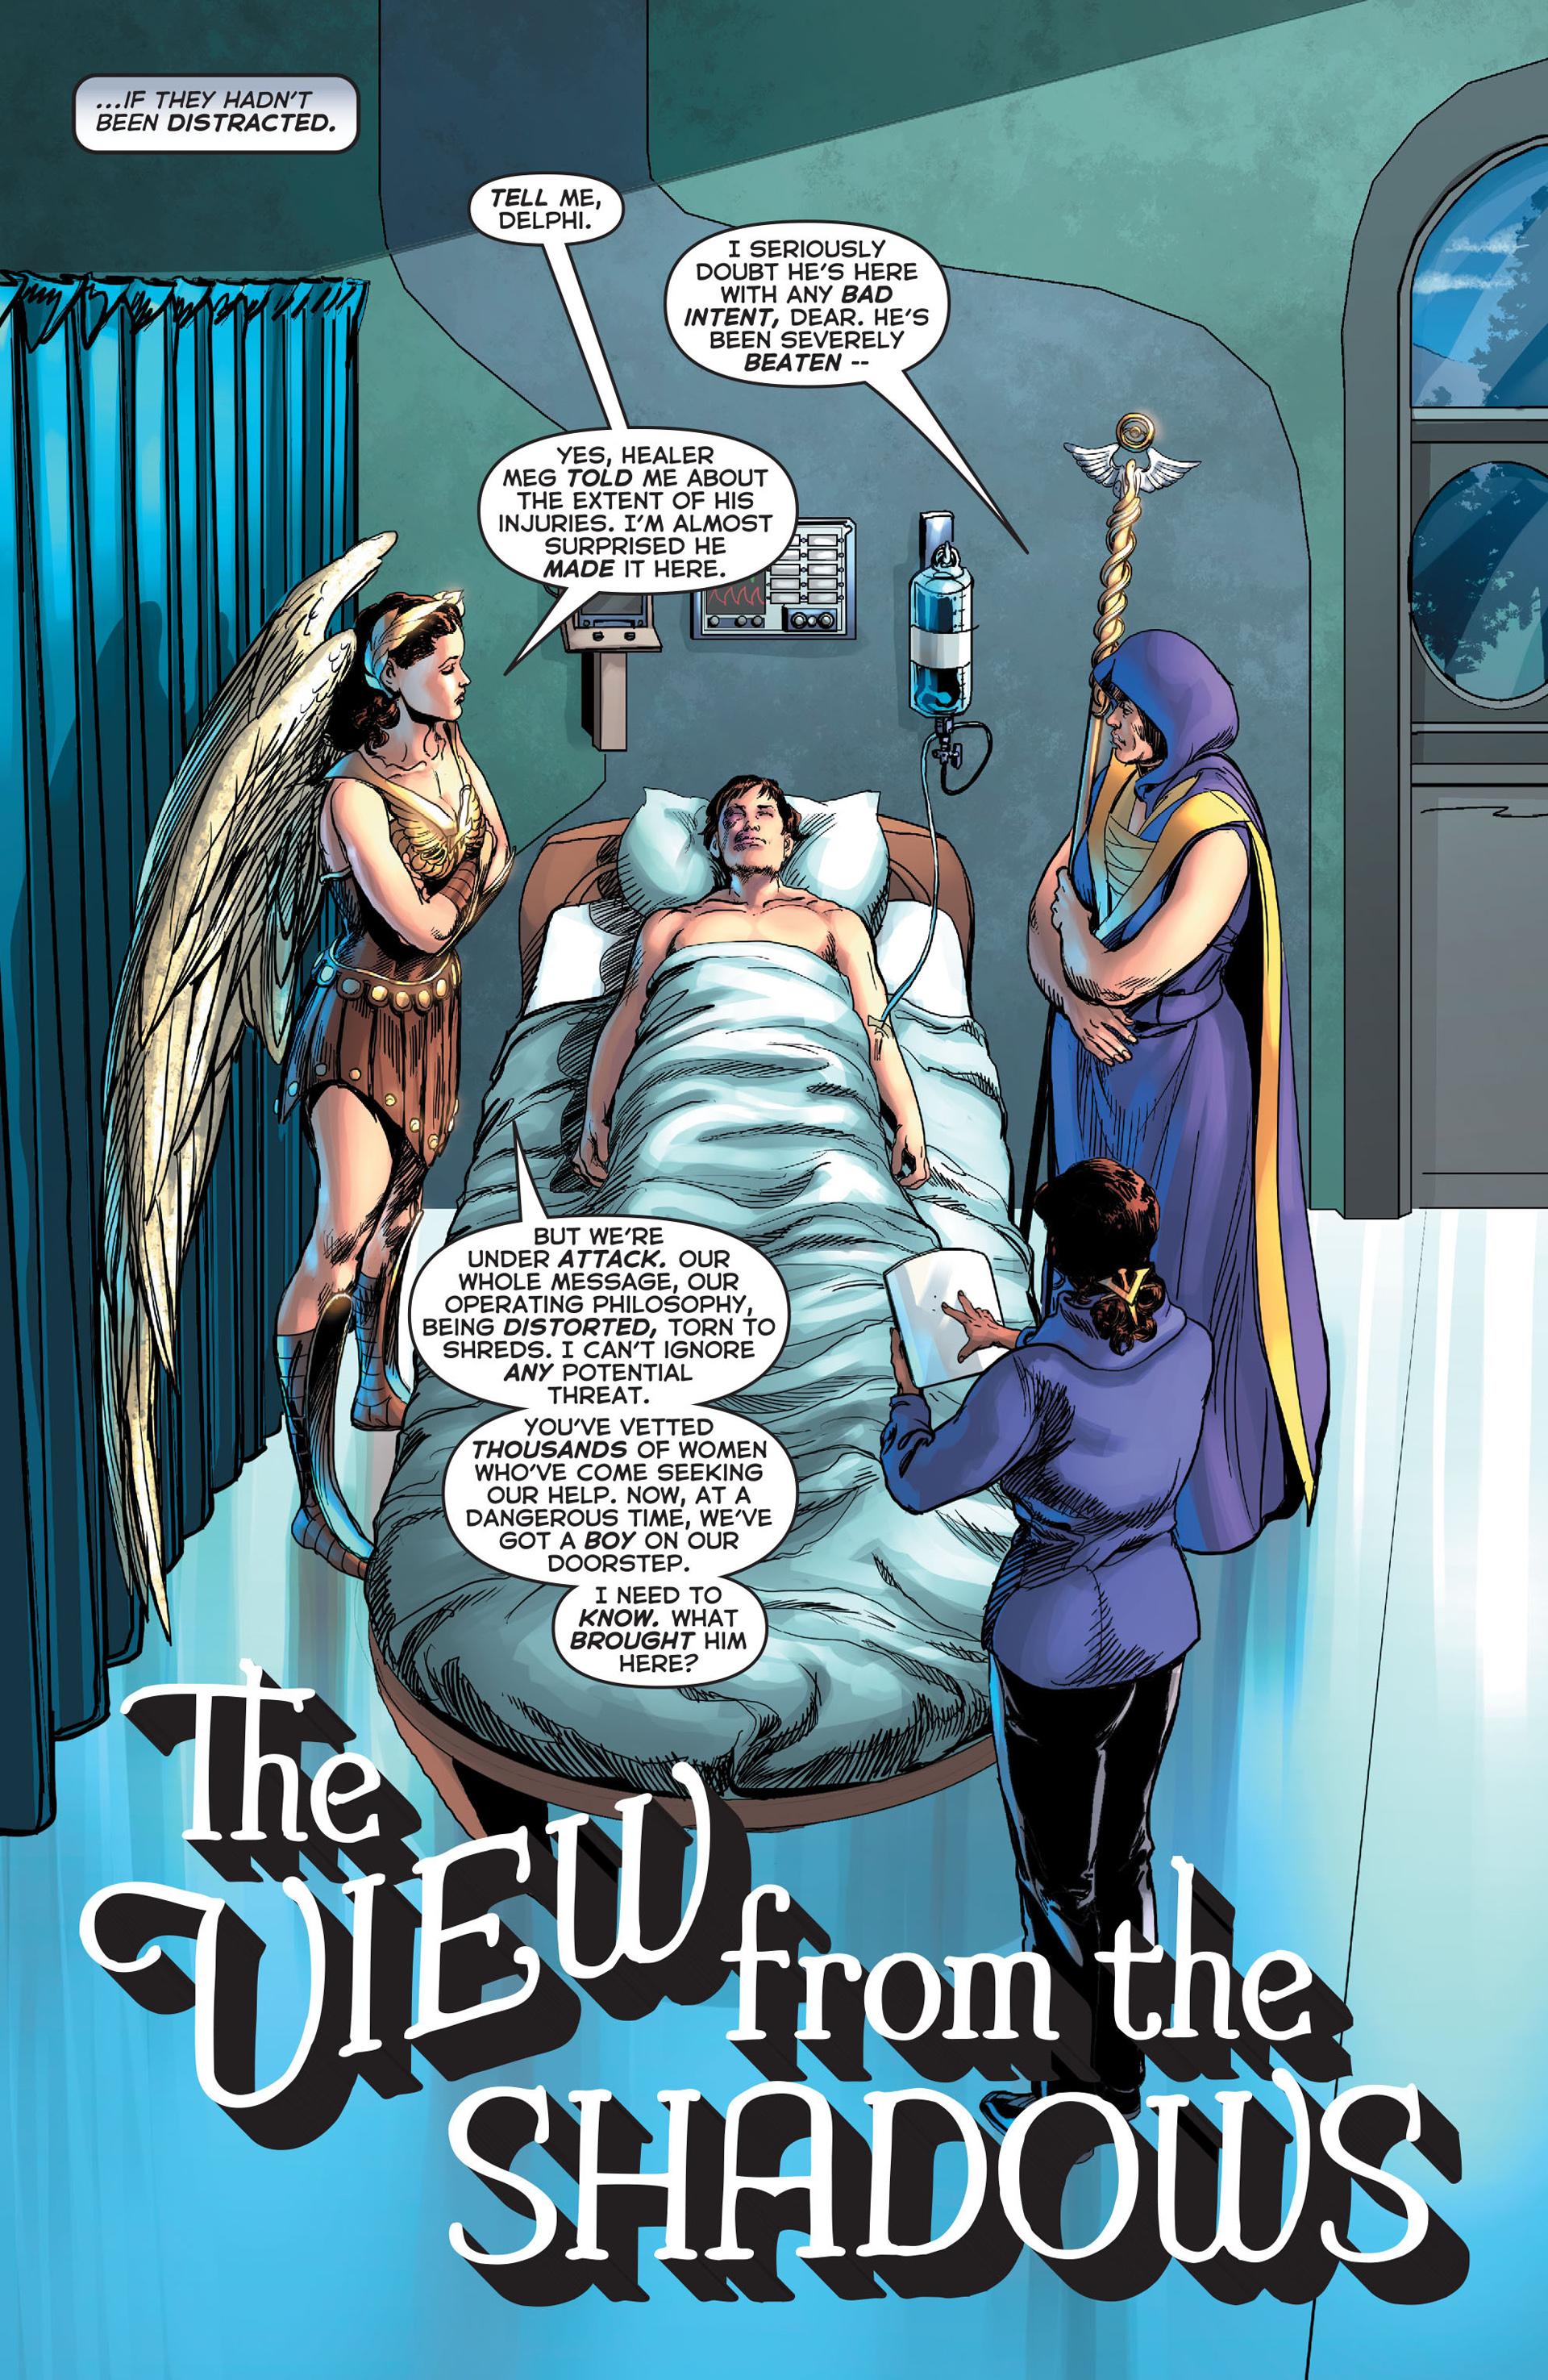 Read online Astro City comic -  Issue #8 - 4